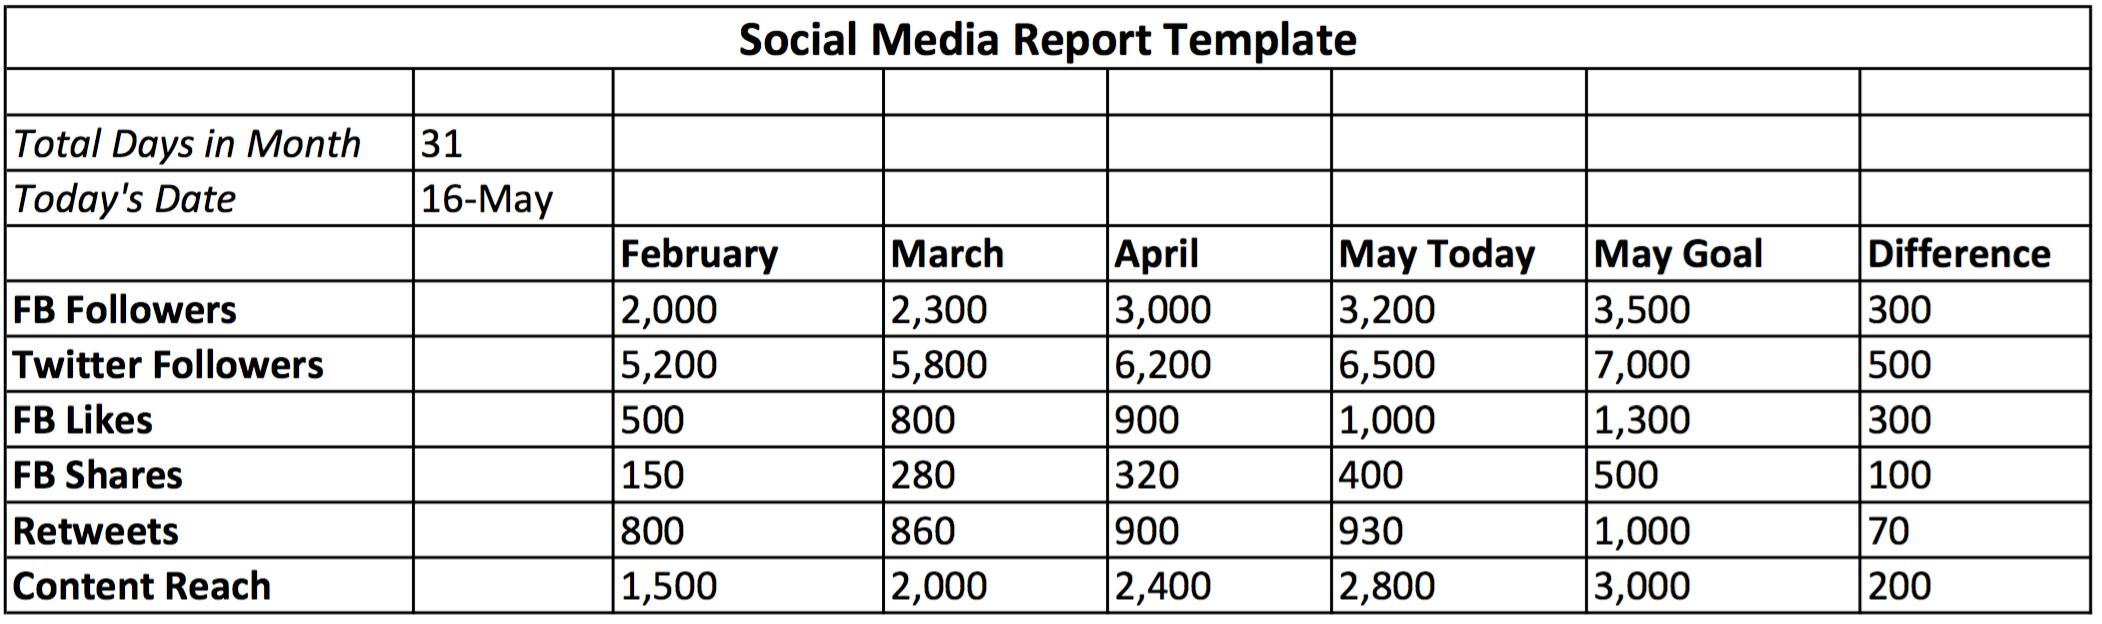 Social_Media_Template.png